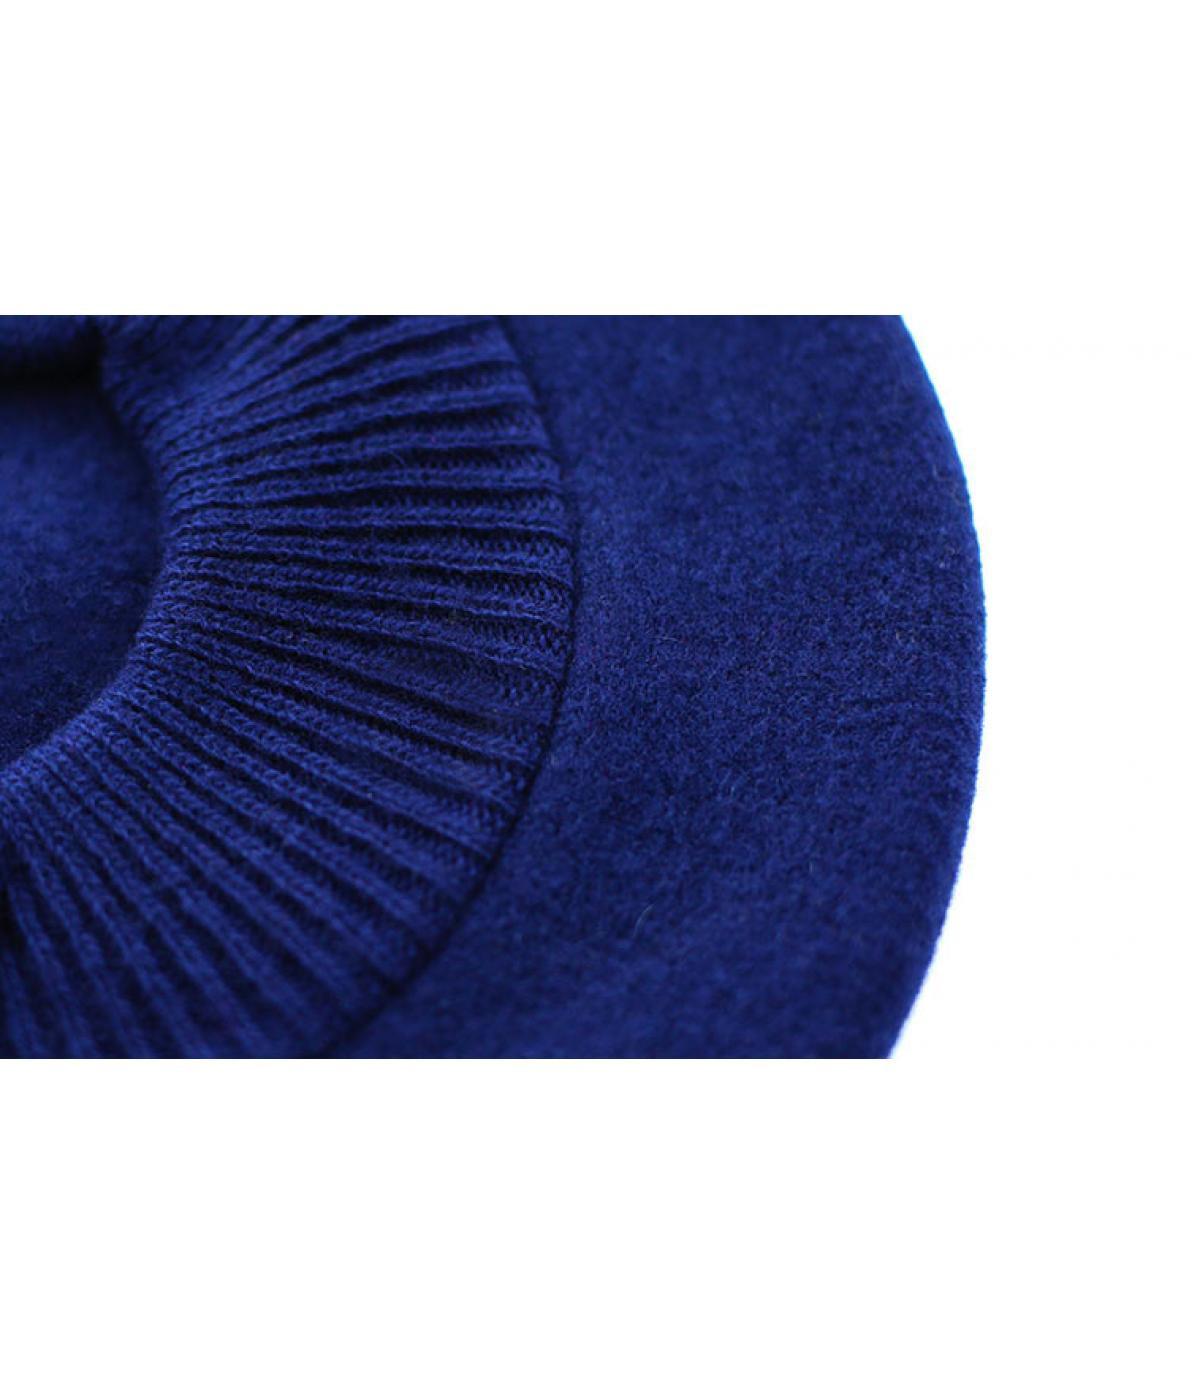 Details Parisienne bleu nuit - Abbildung 3